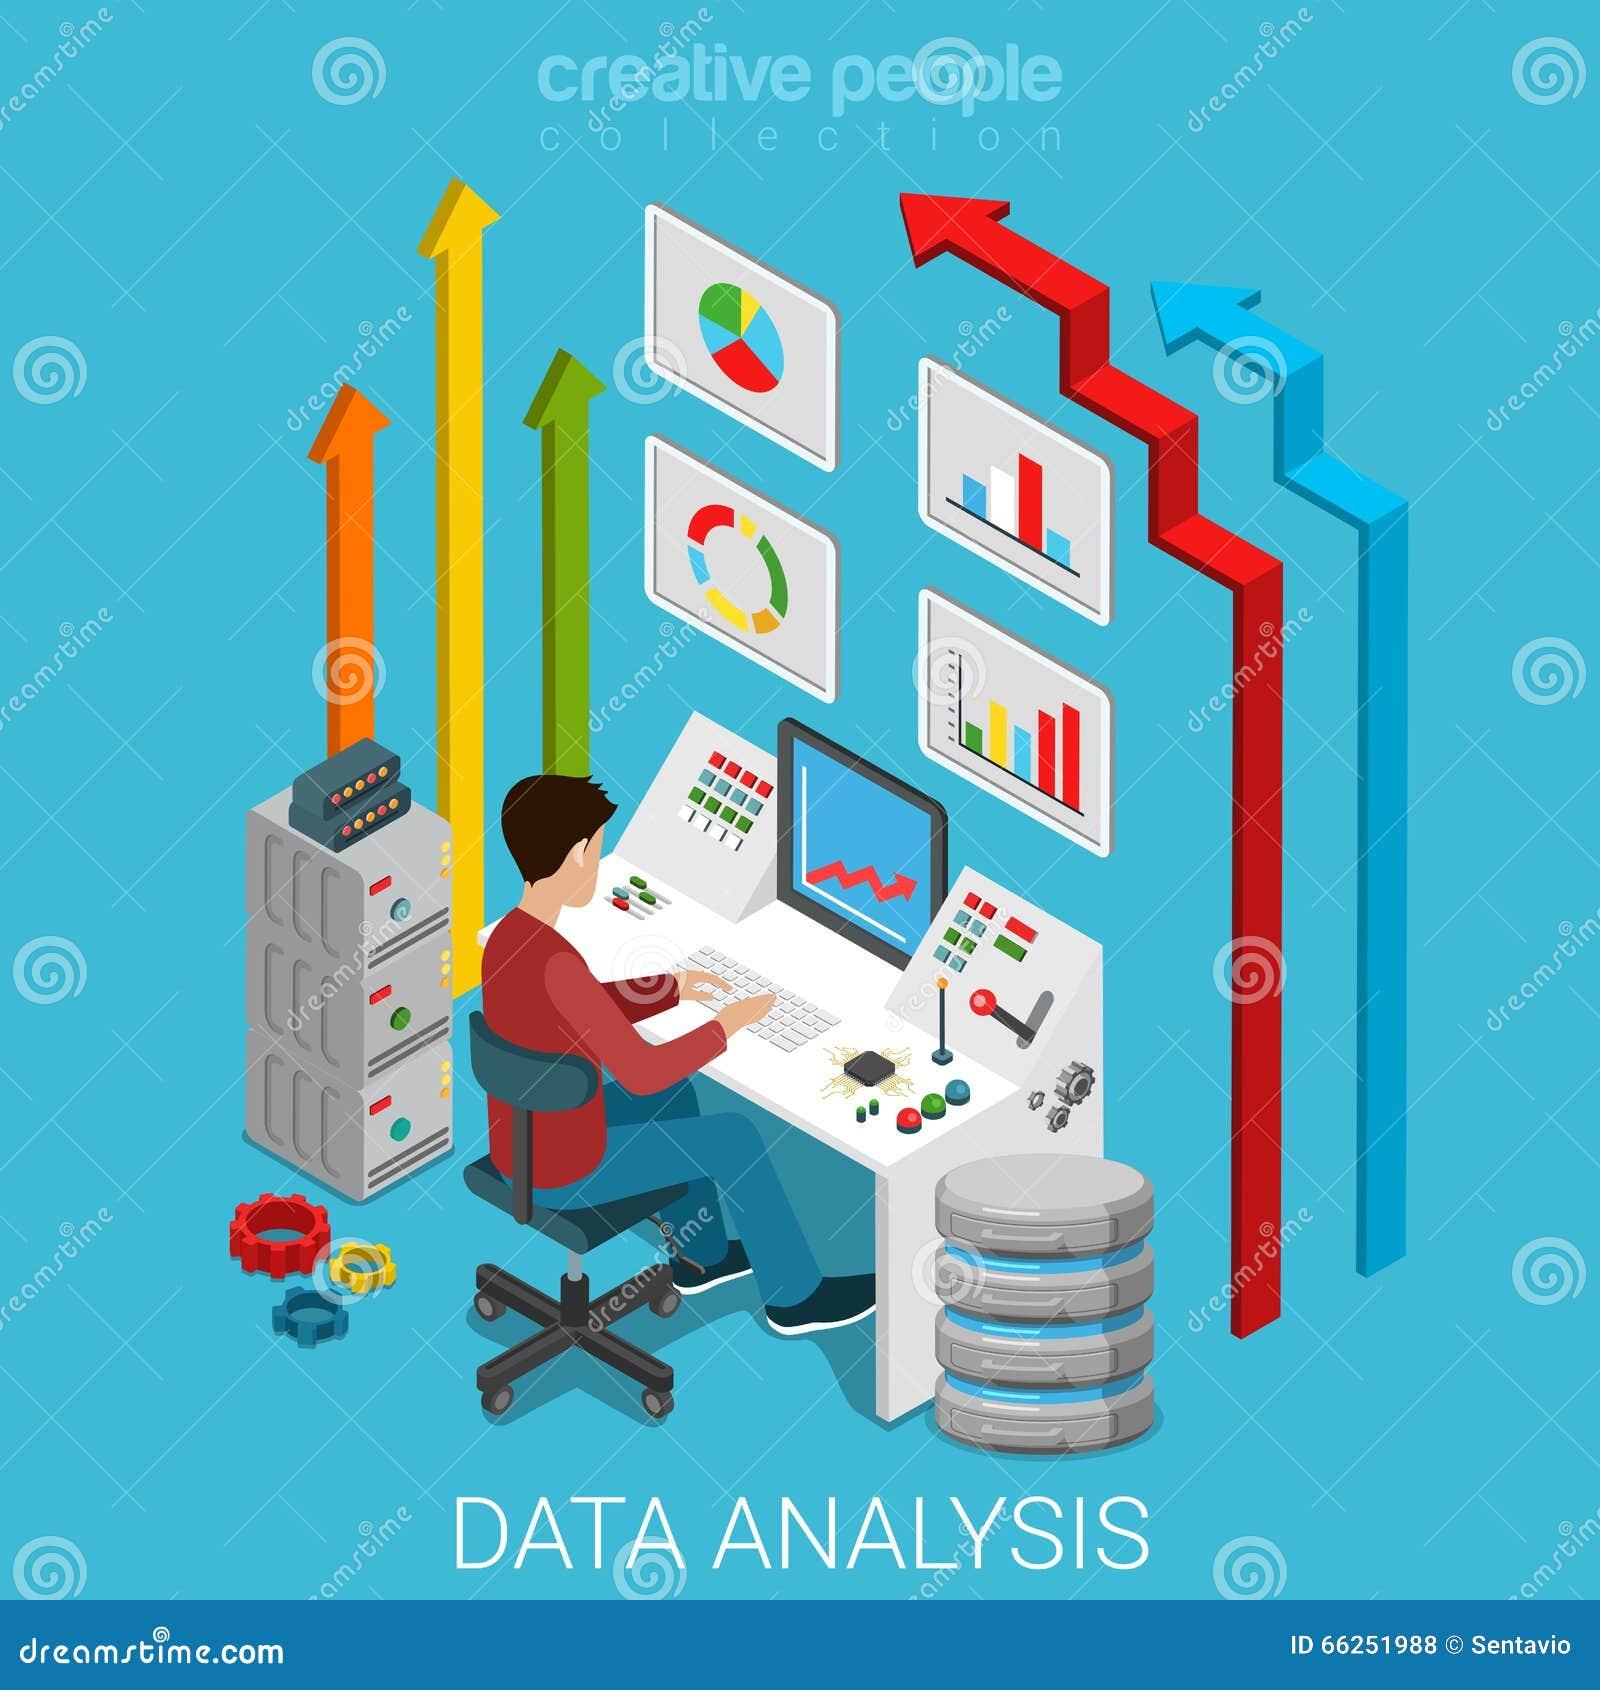 Data analysis business marketing server vector flat 3d isometric